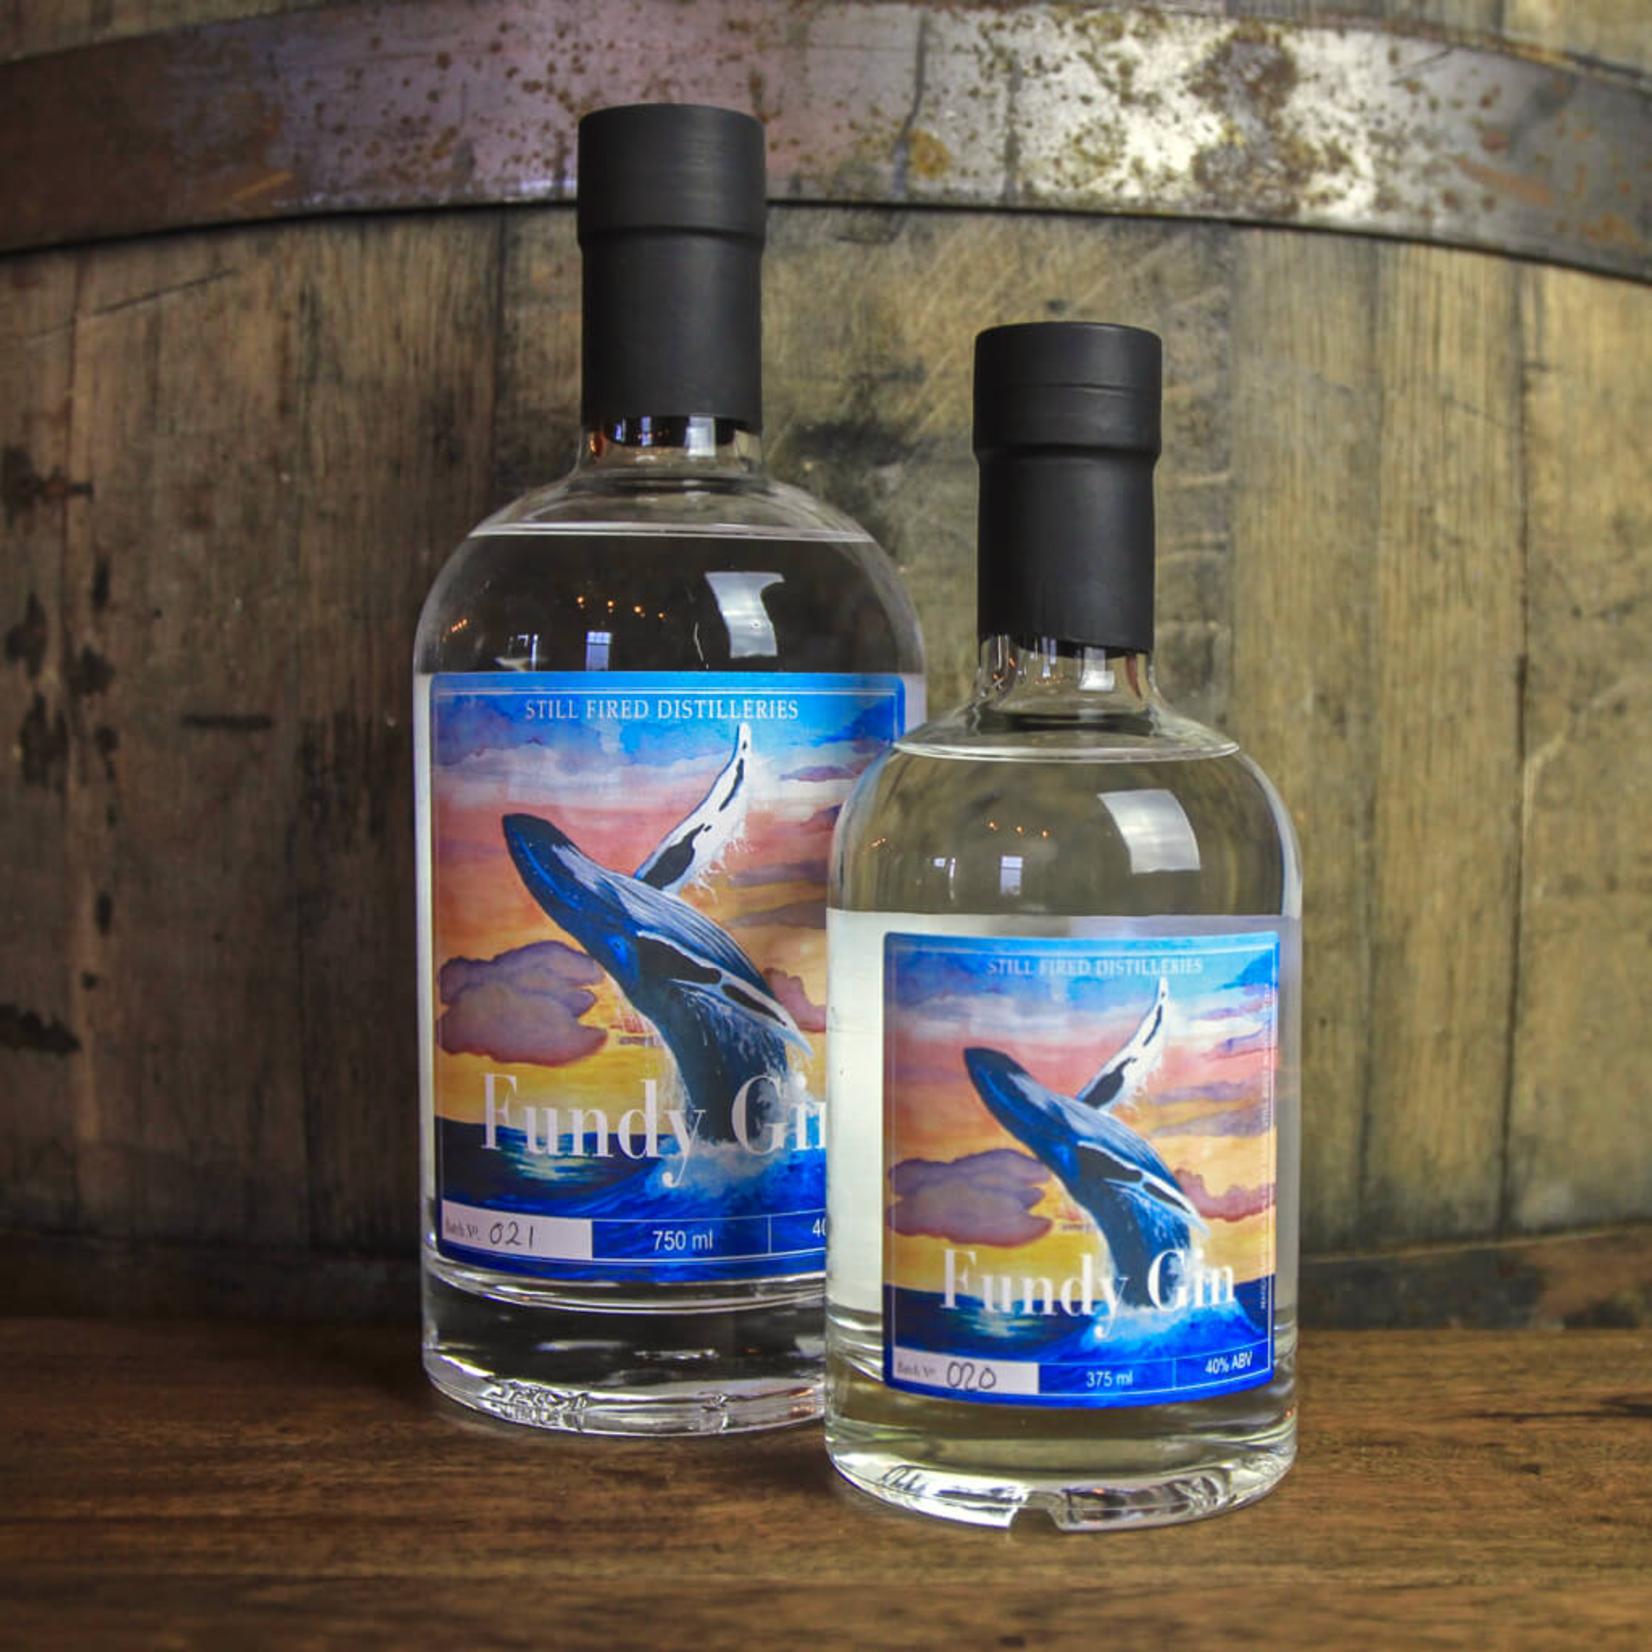 Spirits Still Fired Distilleries Fundy Gin Nova Scotia